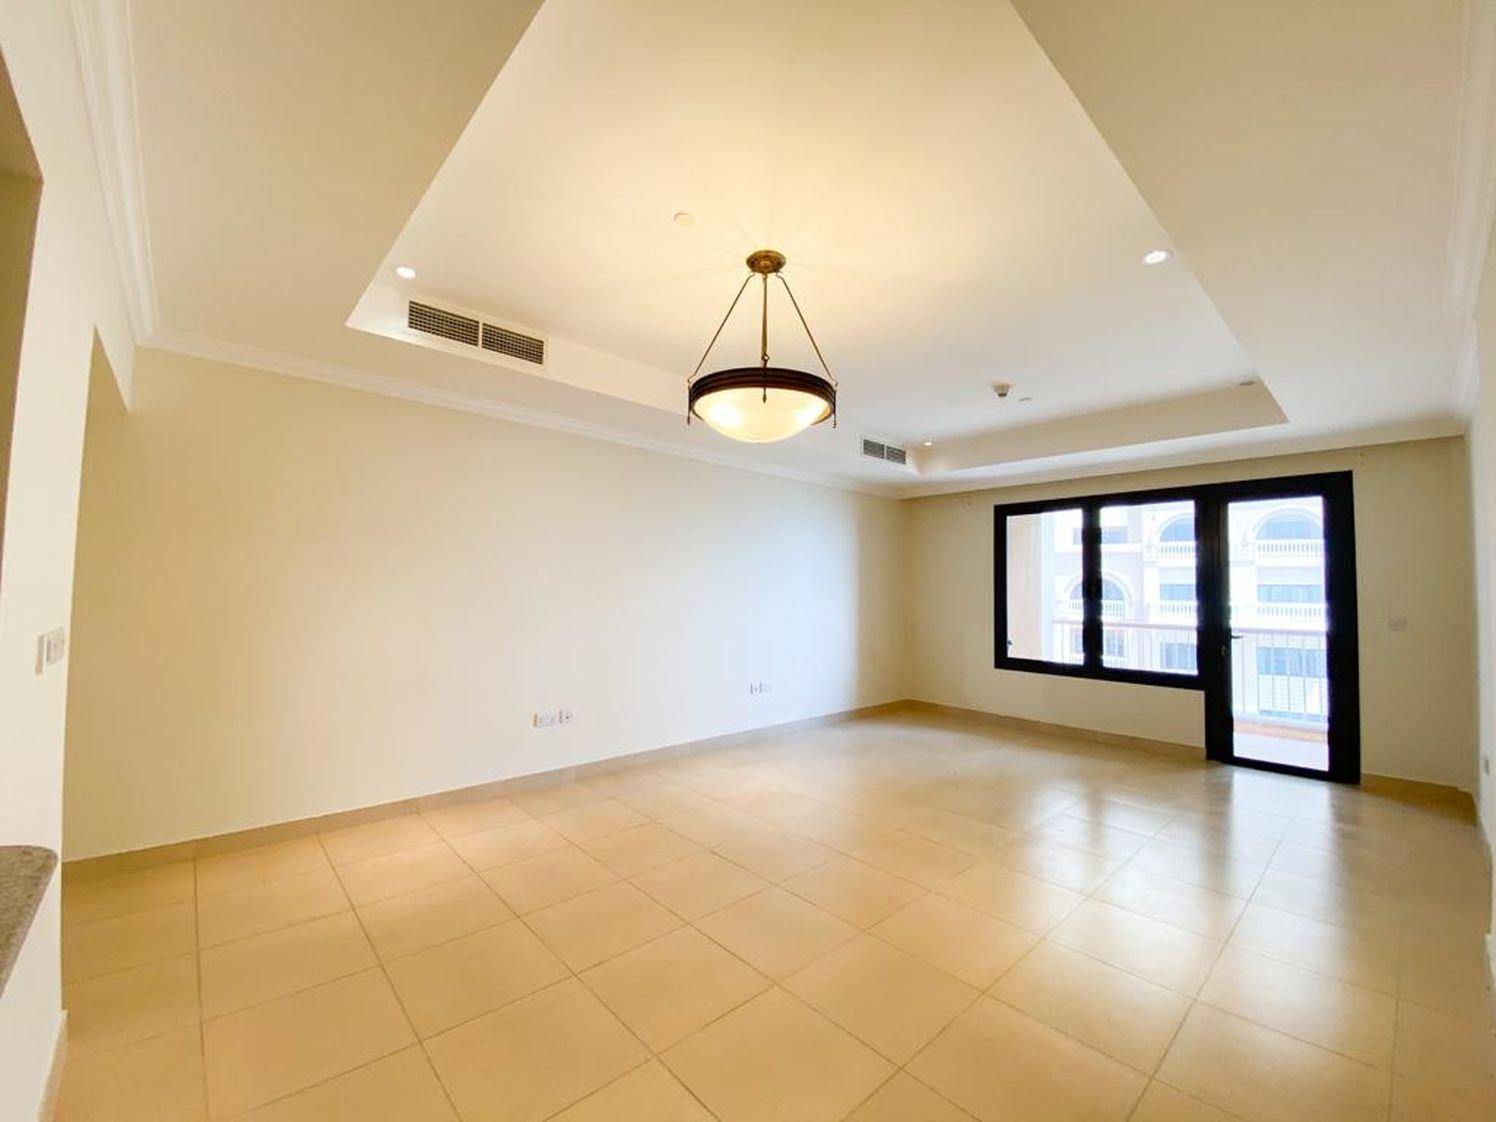 Ad Rental Apartment Doha The Pearl, 2 Rooms ref:L1877DA